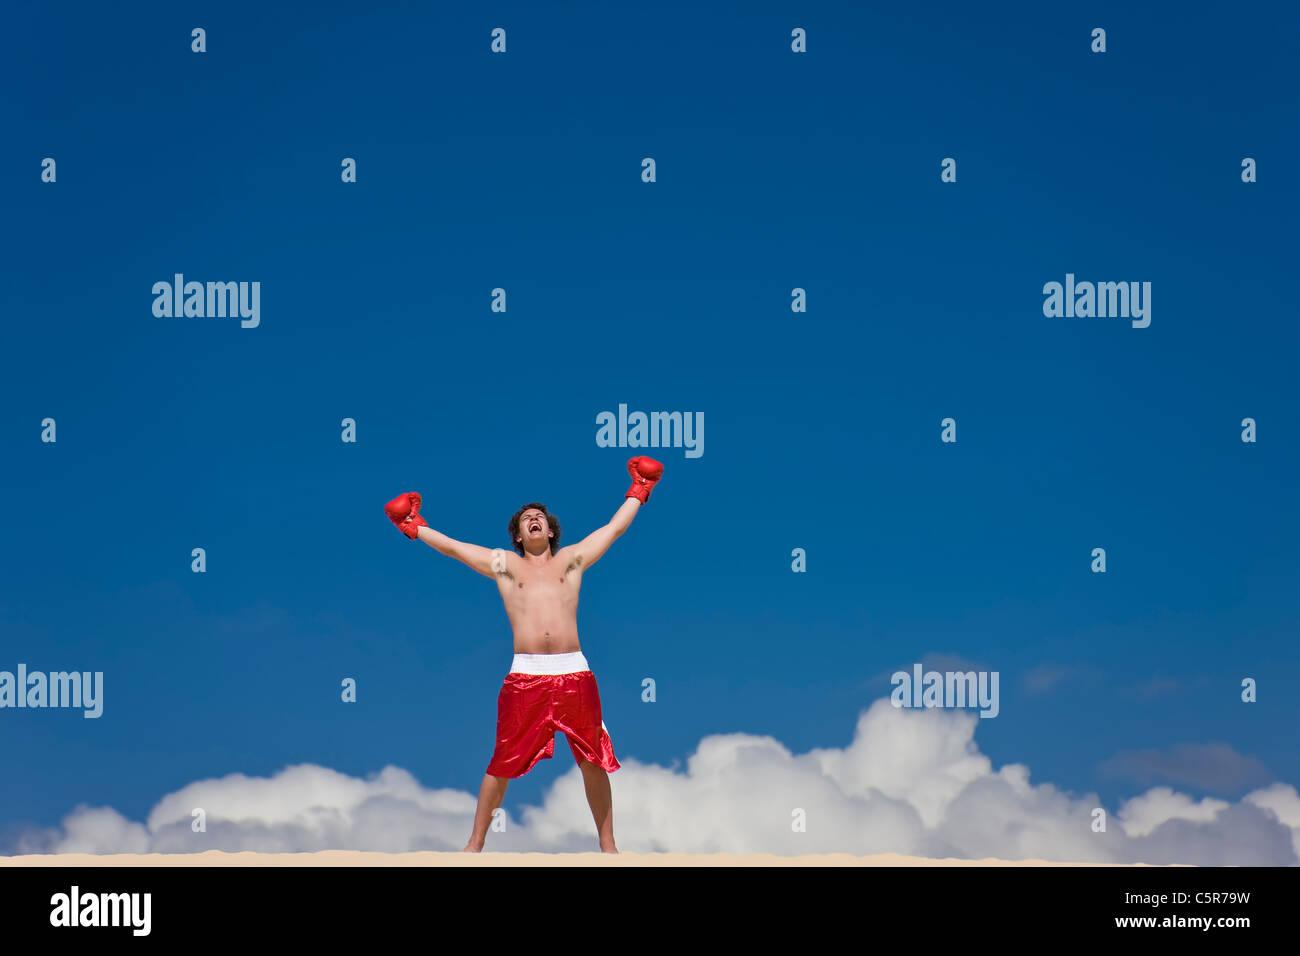 A boxer celebrates on cloud nine. - Stock Image